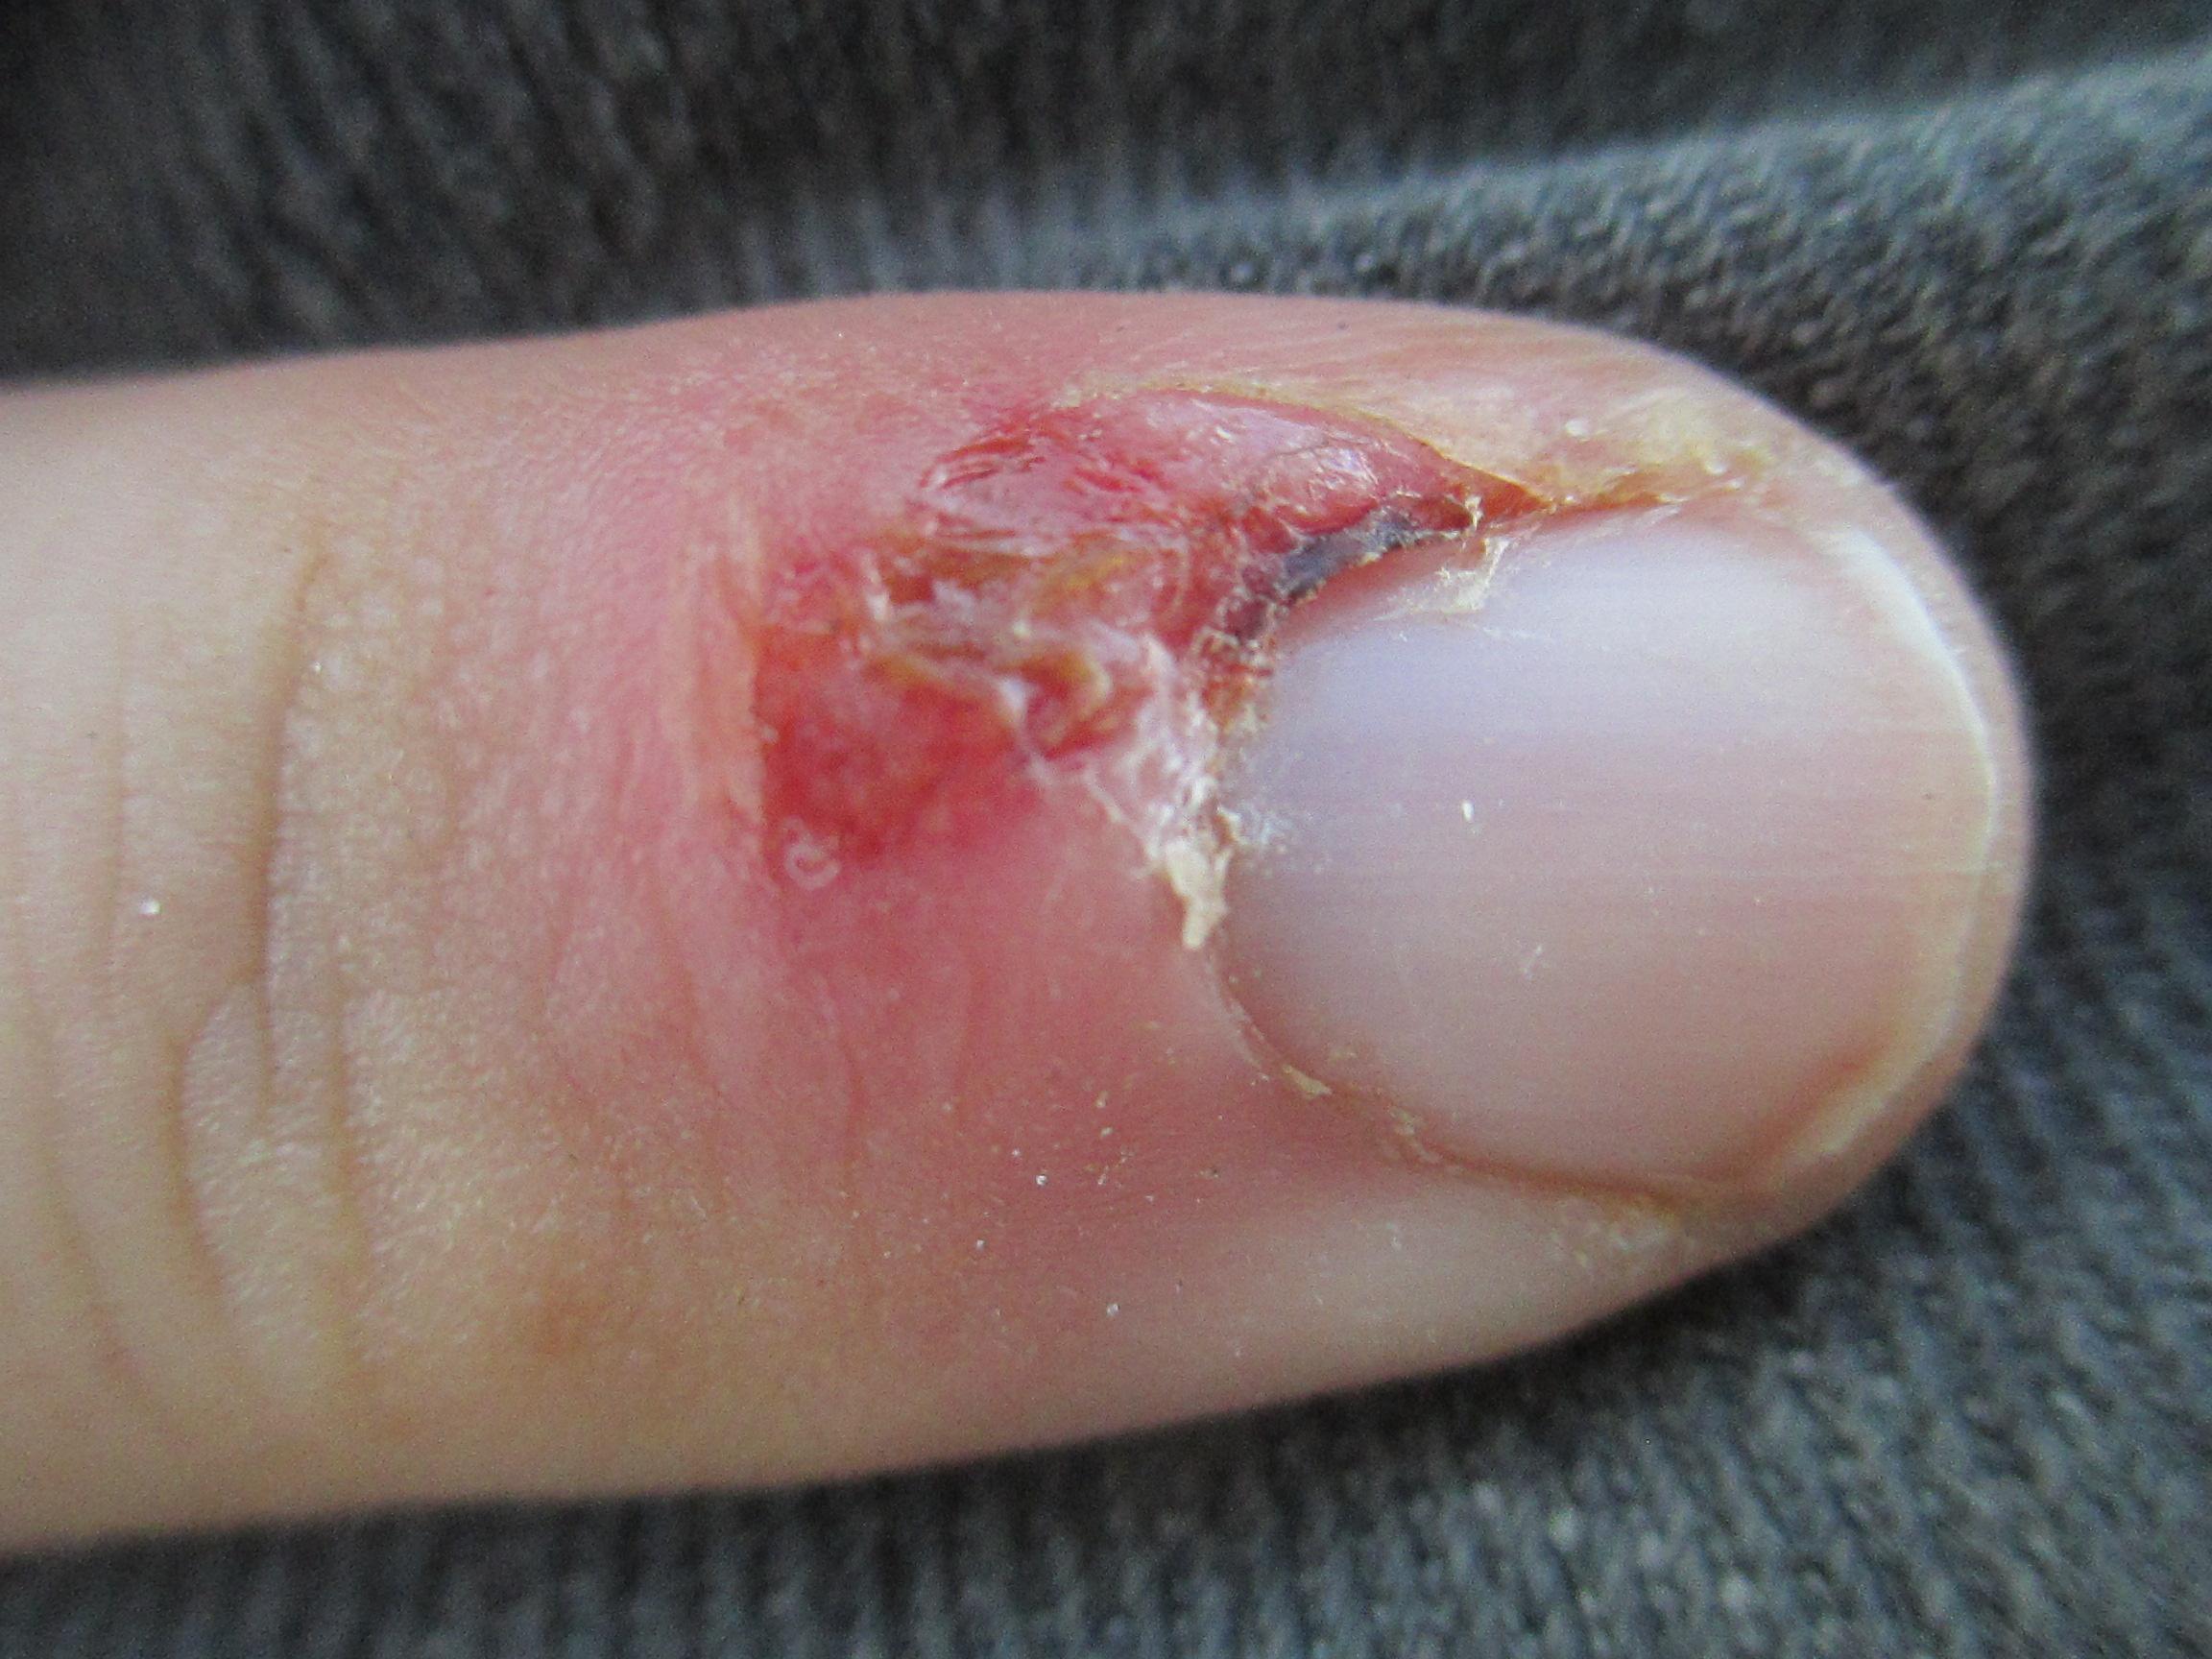 ingrown fingernail – Richard T. Reilly